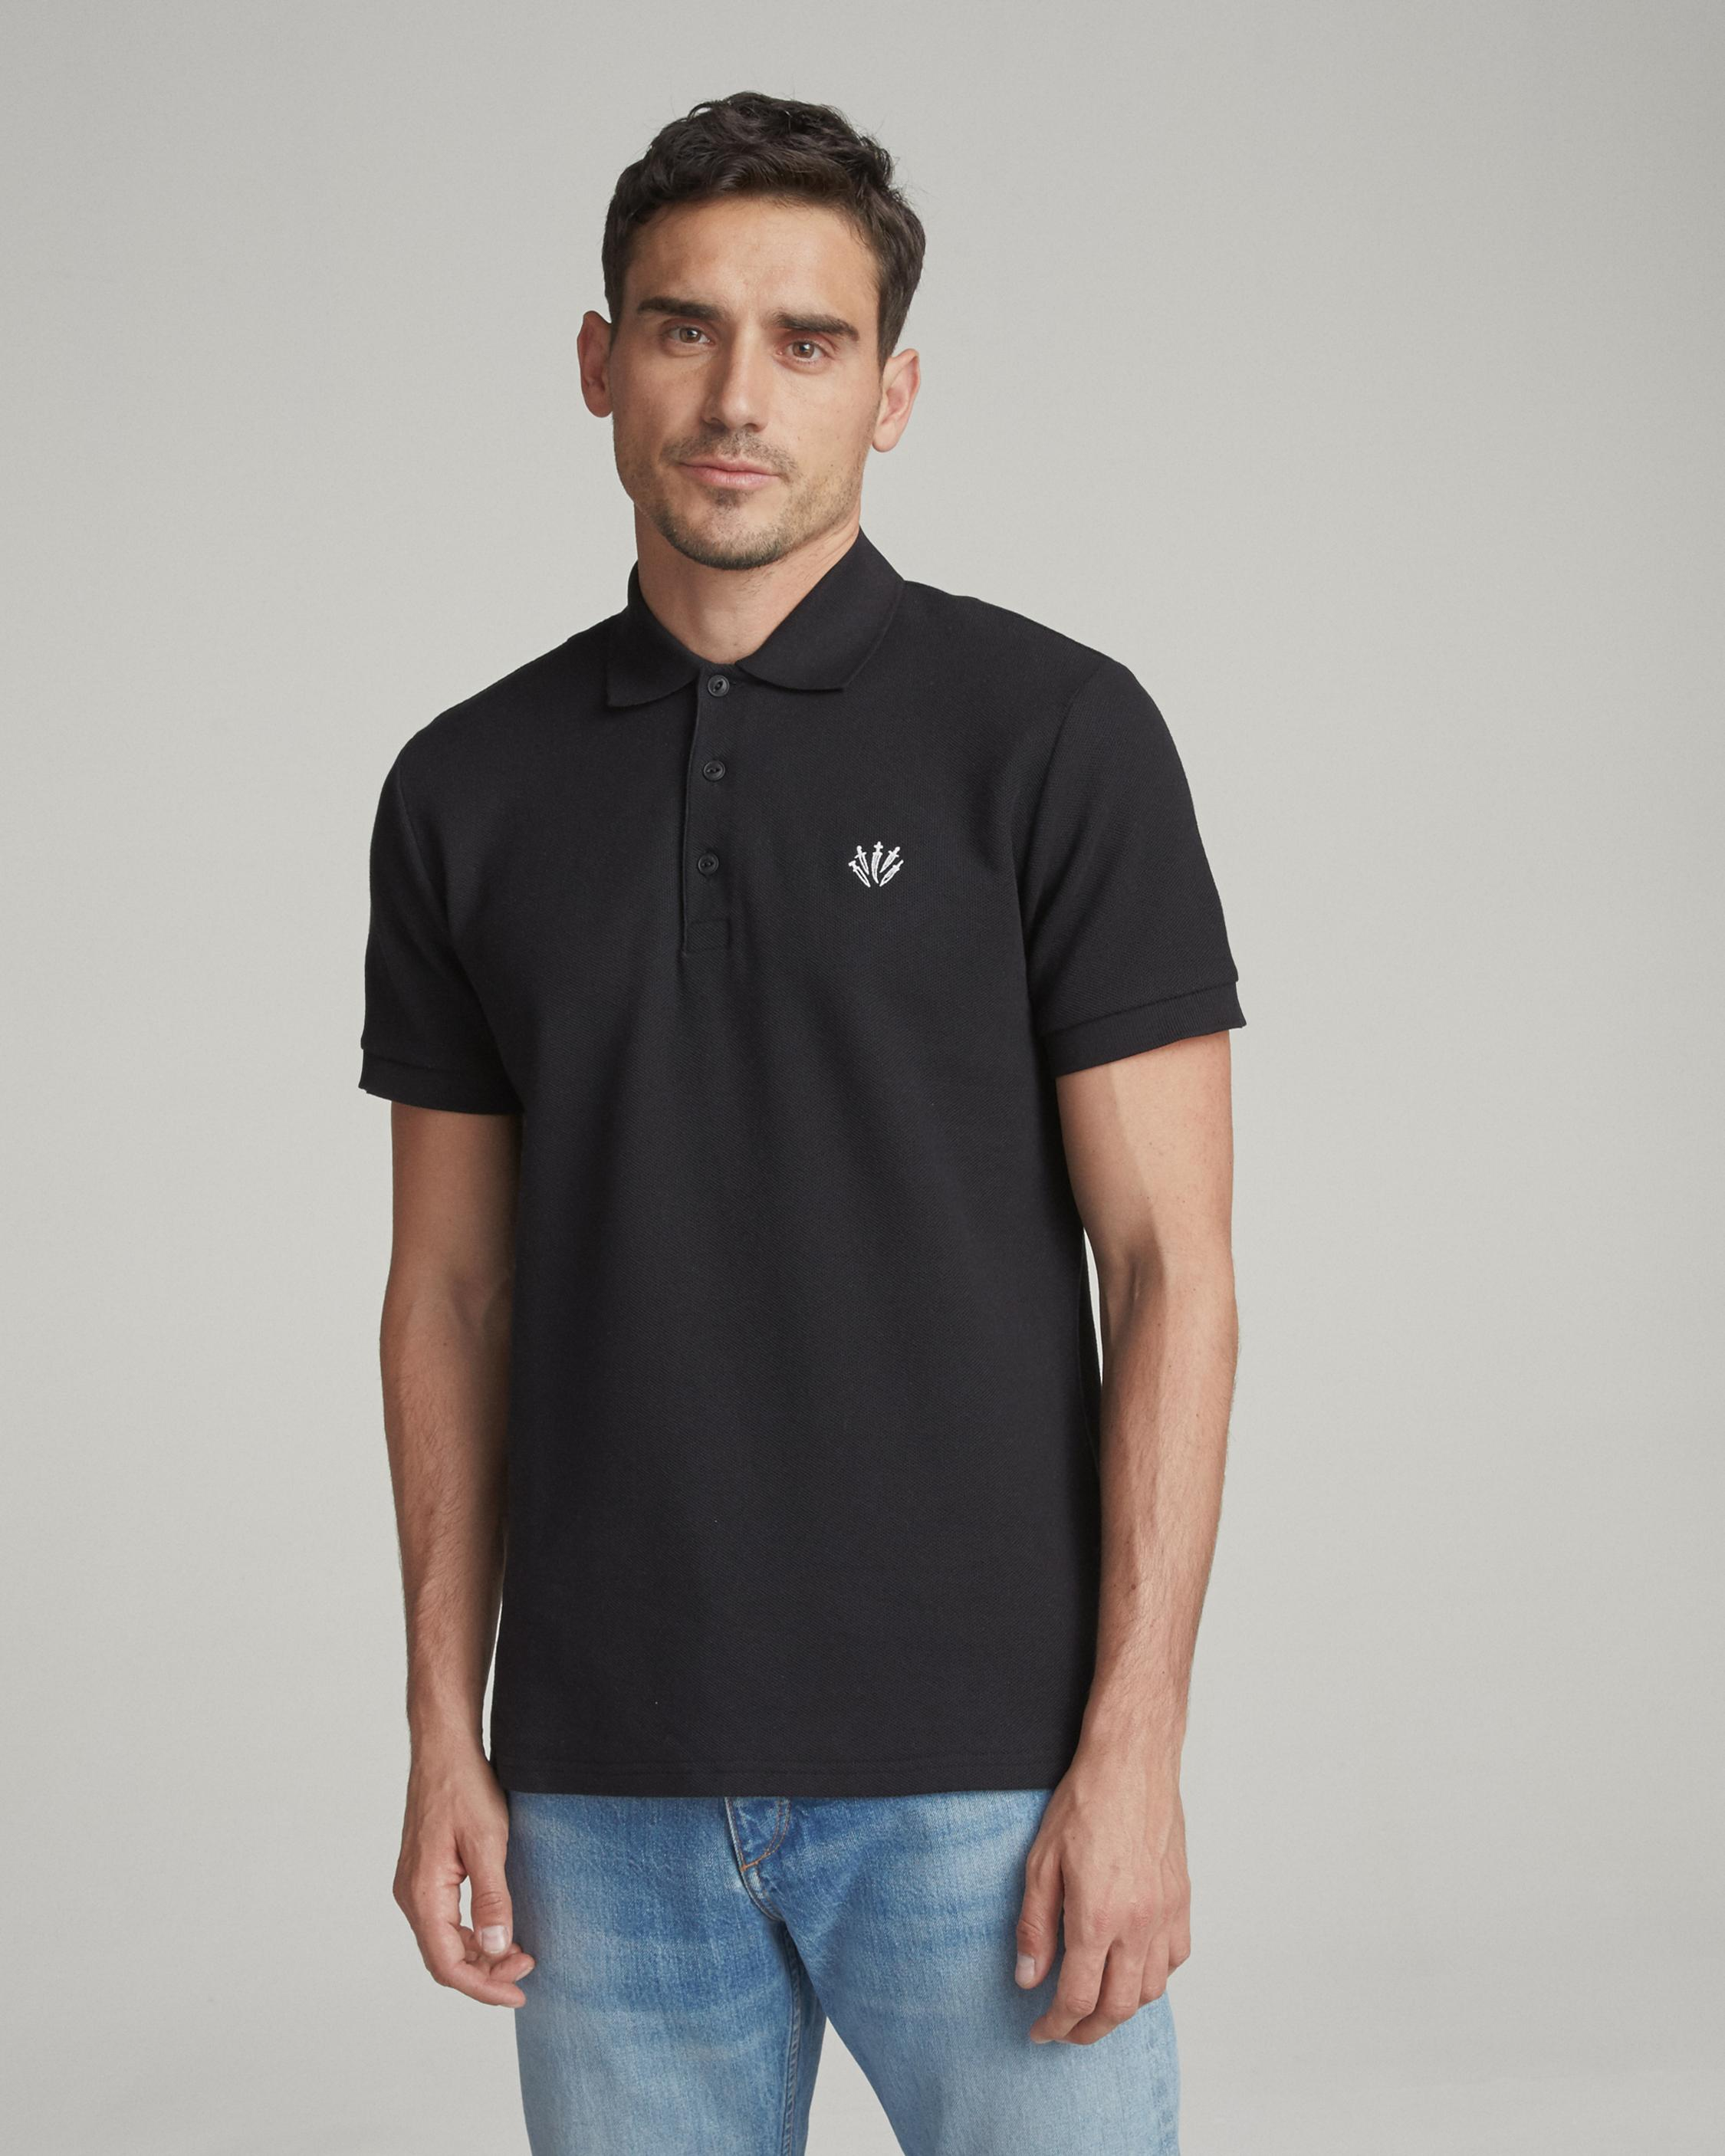 Rag & Bone Woman Cotton Piqué T-shirt Black Size S Rag & Bone Discount Lowest Price Buy Cheap Genuine dwZ9LFZTfT